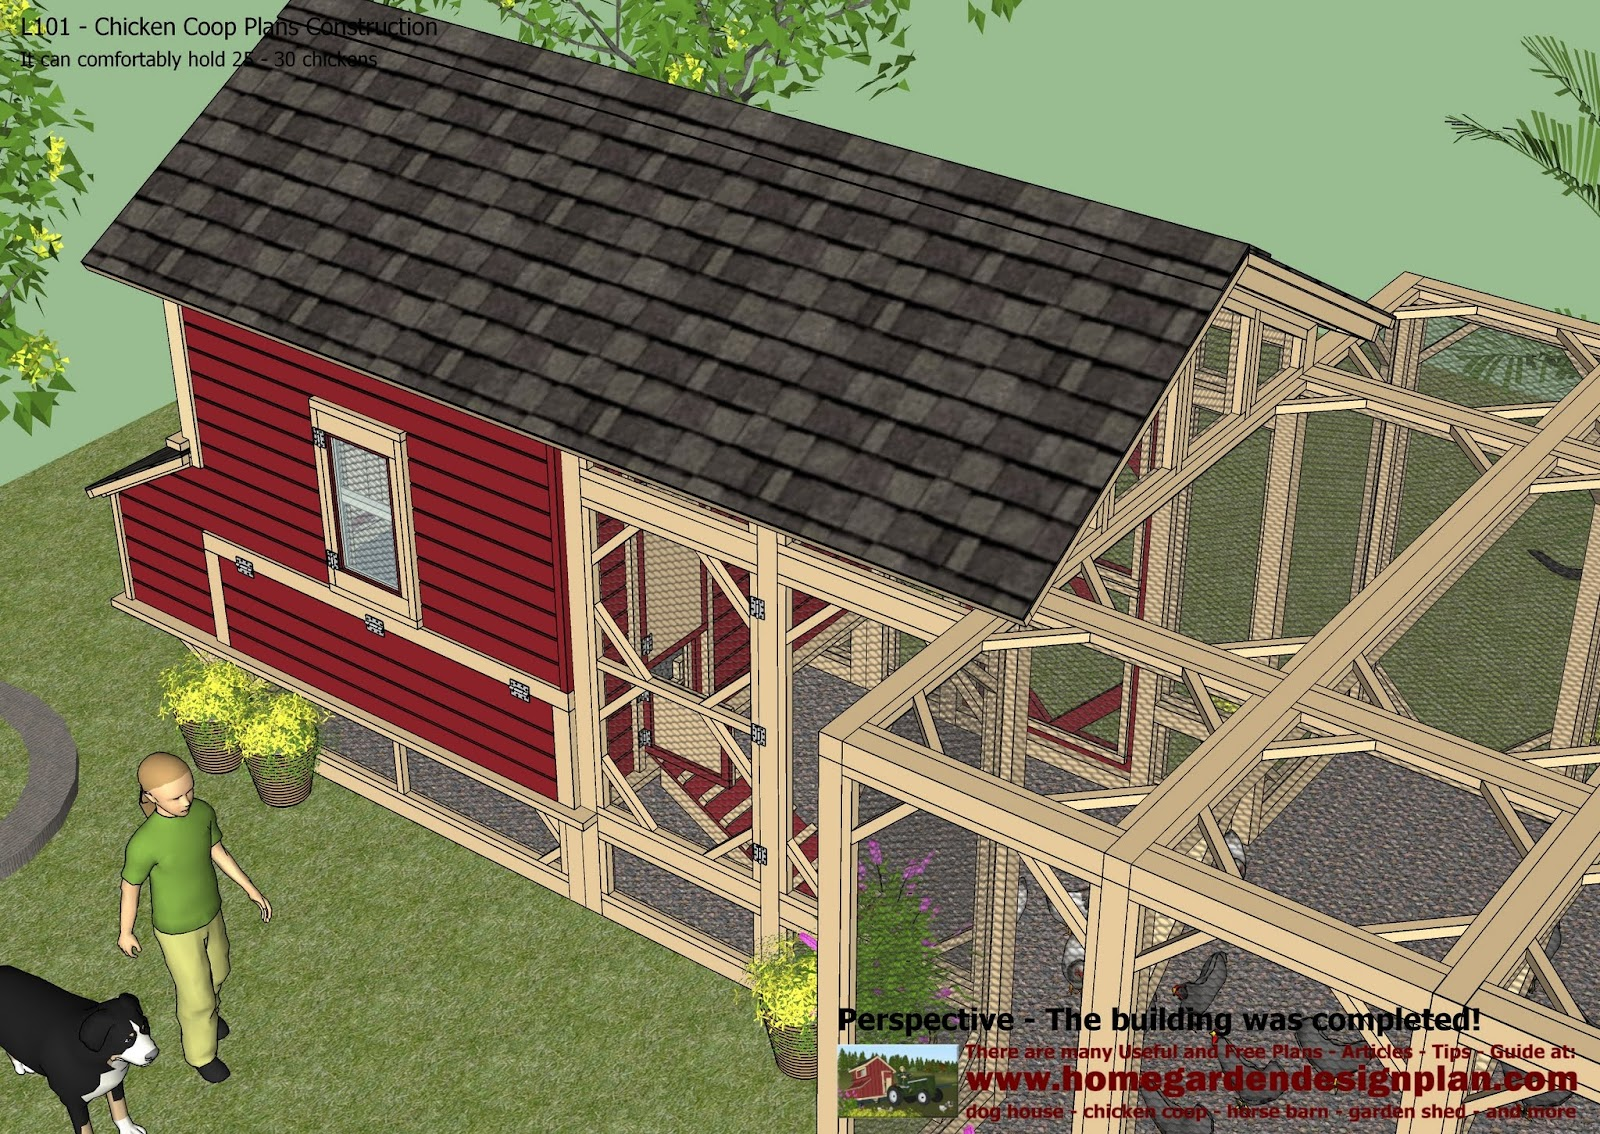 Chicken Coop Plans Construction - Chicken Coop Design - How To Build ...